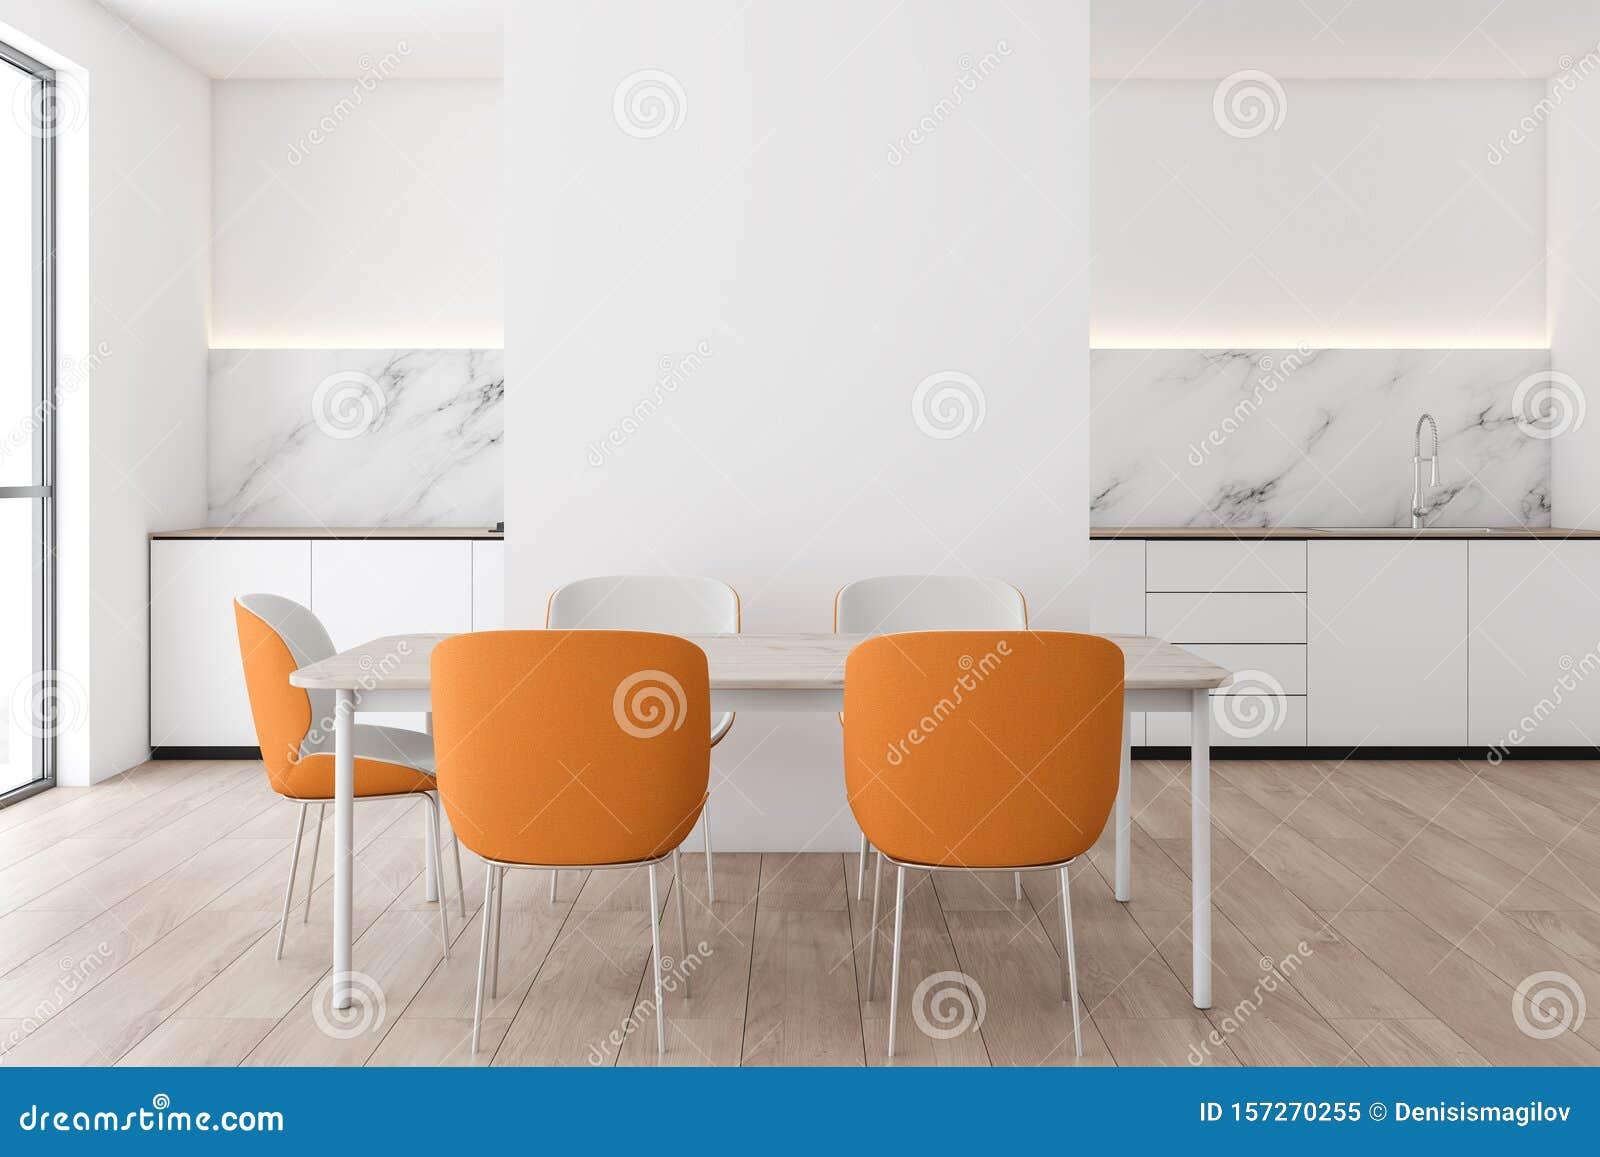 White Marble Kitchen Interior With Orange Chairs Stock Illustration Illustration Of Elegant Contemporary 157270255